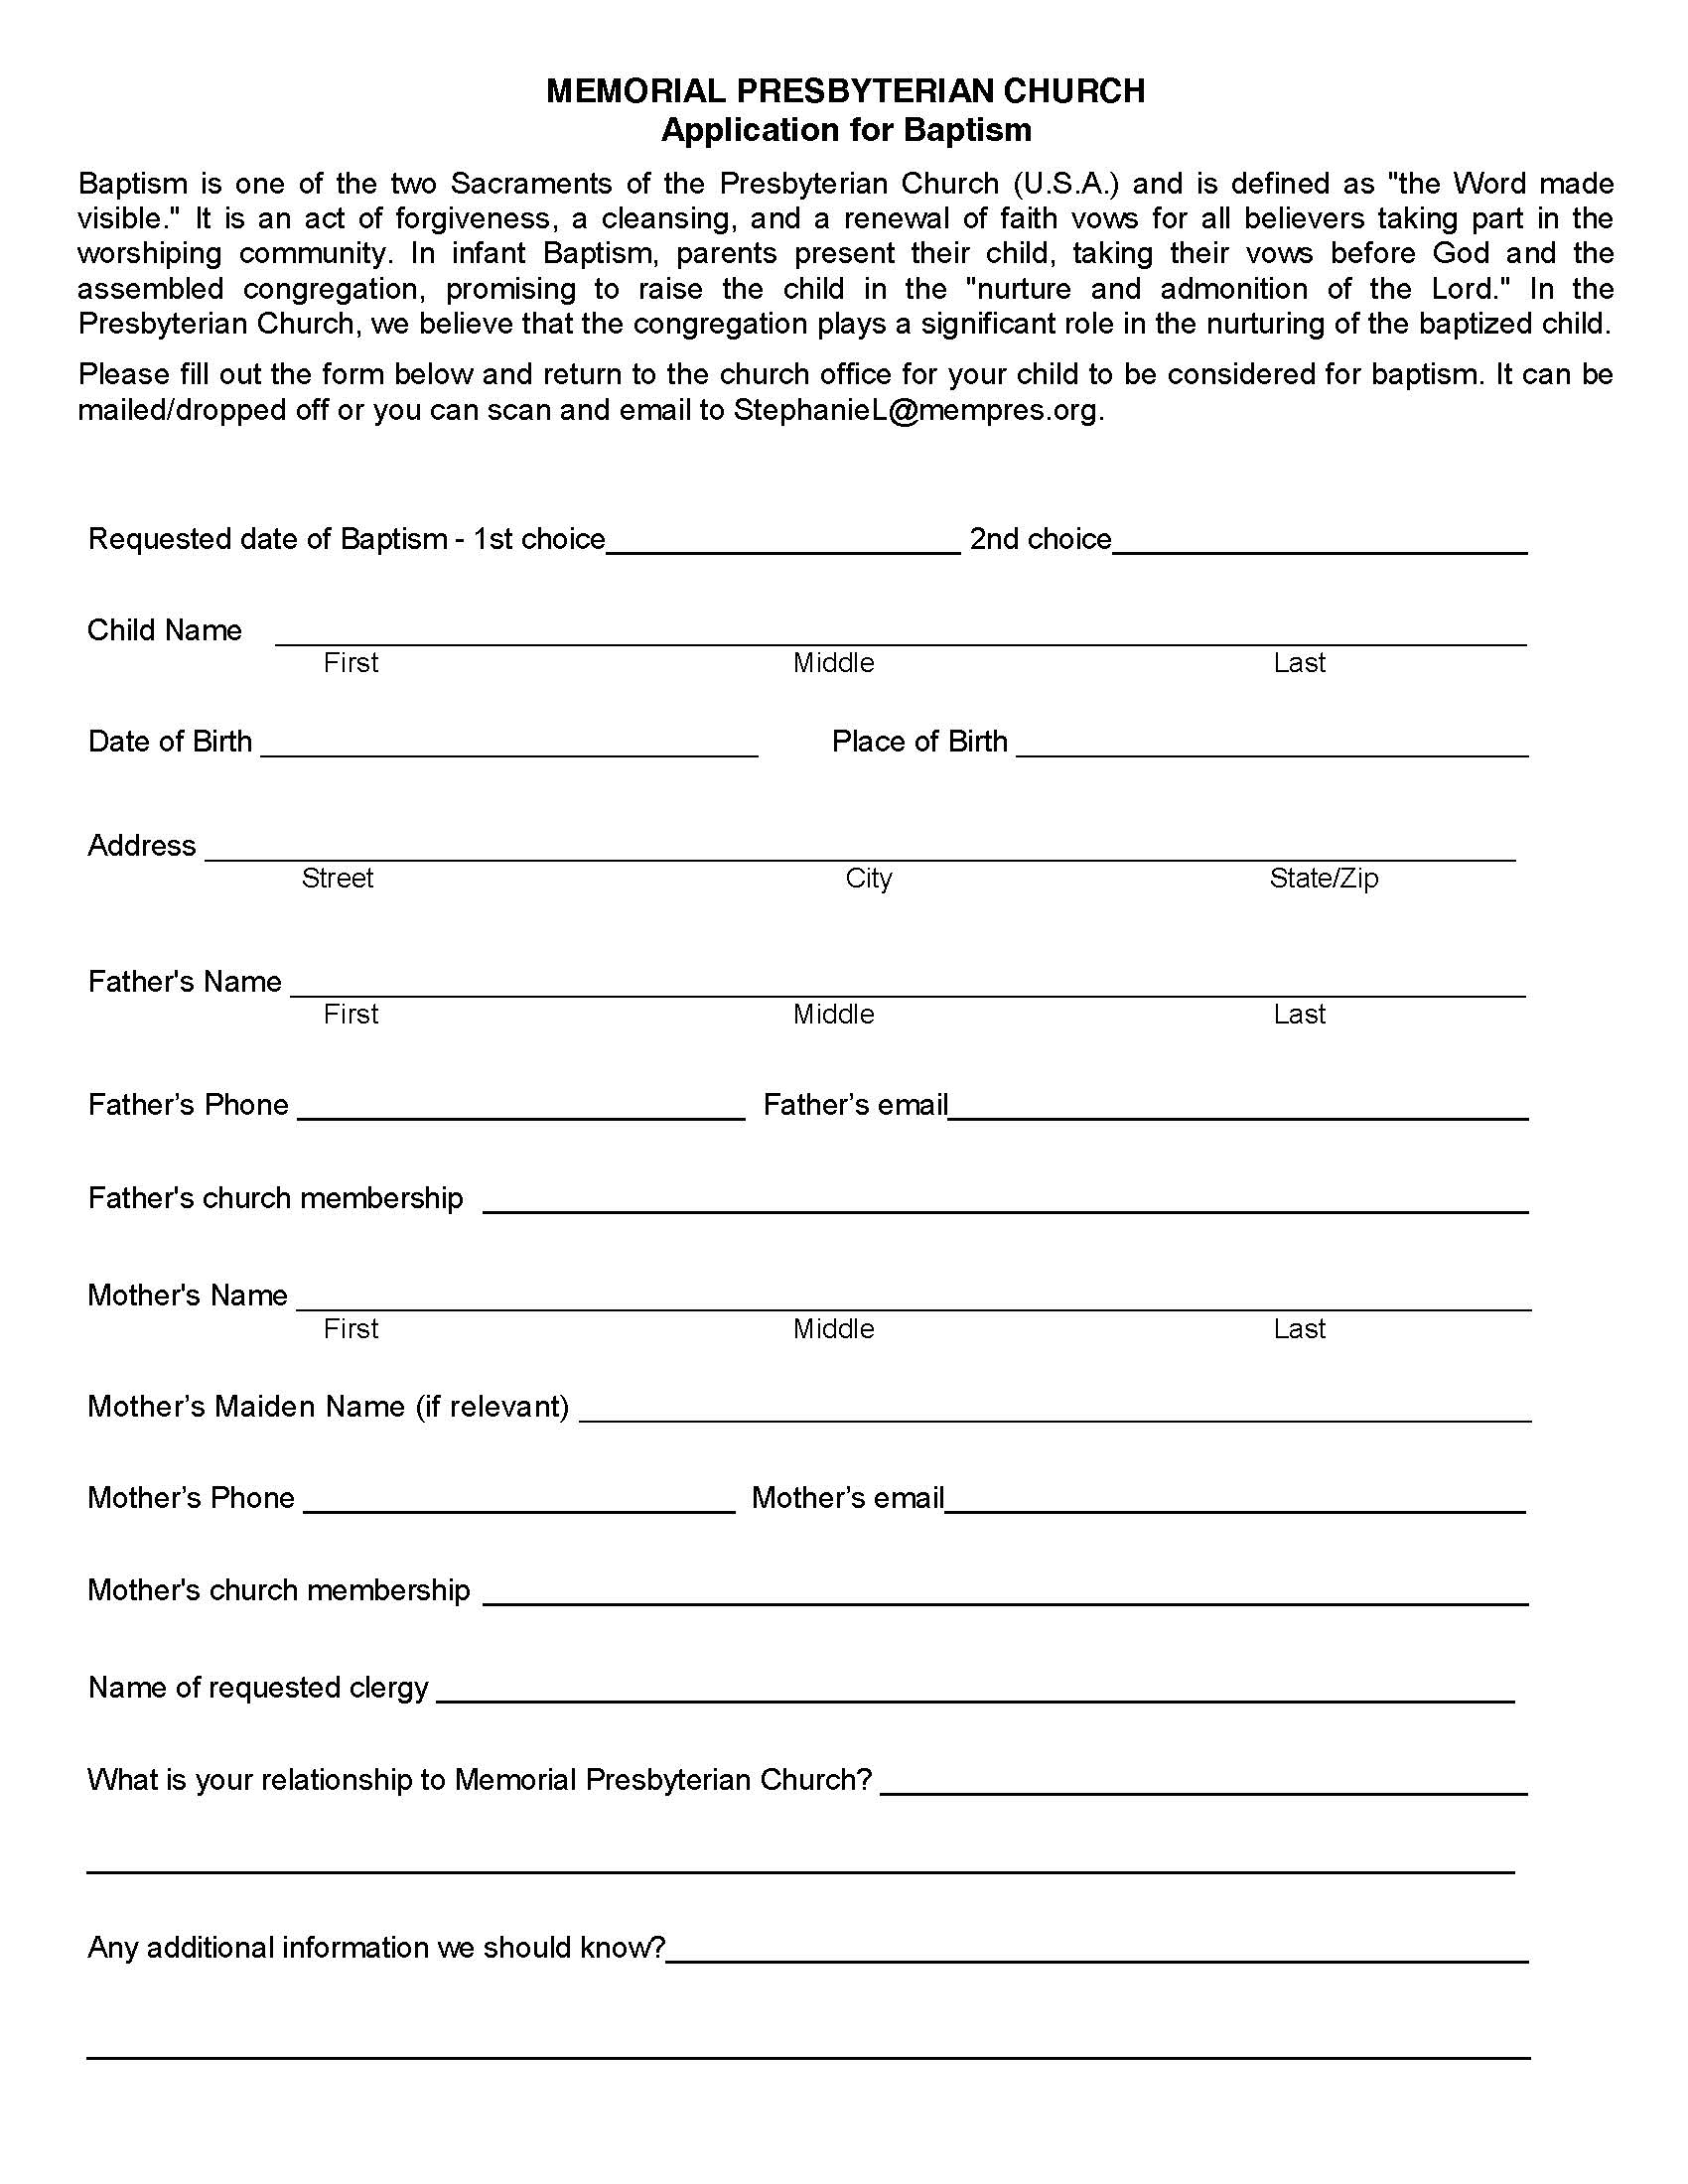 Baptism Application -